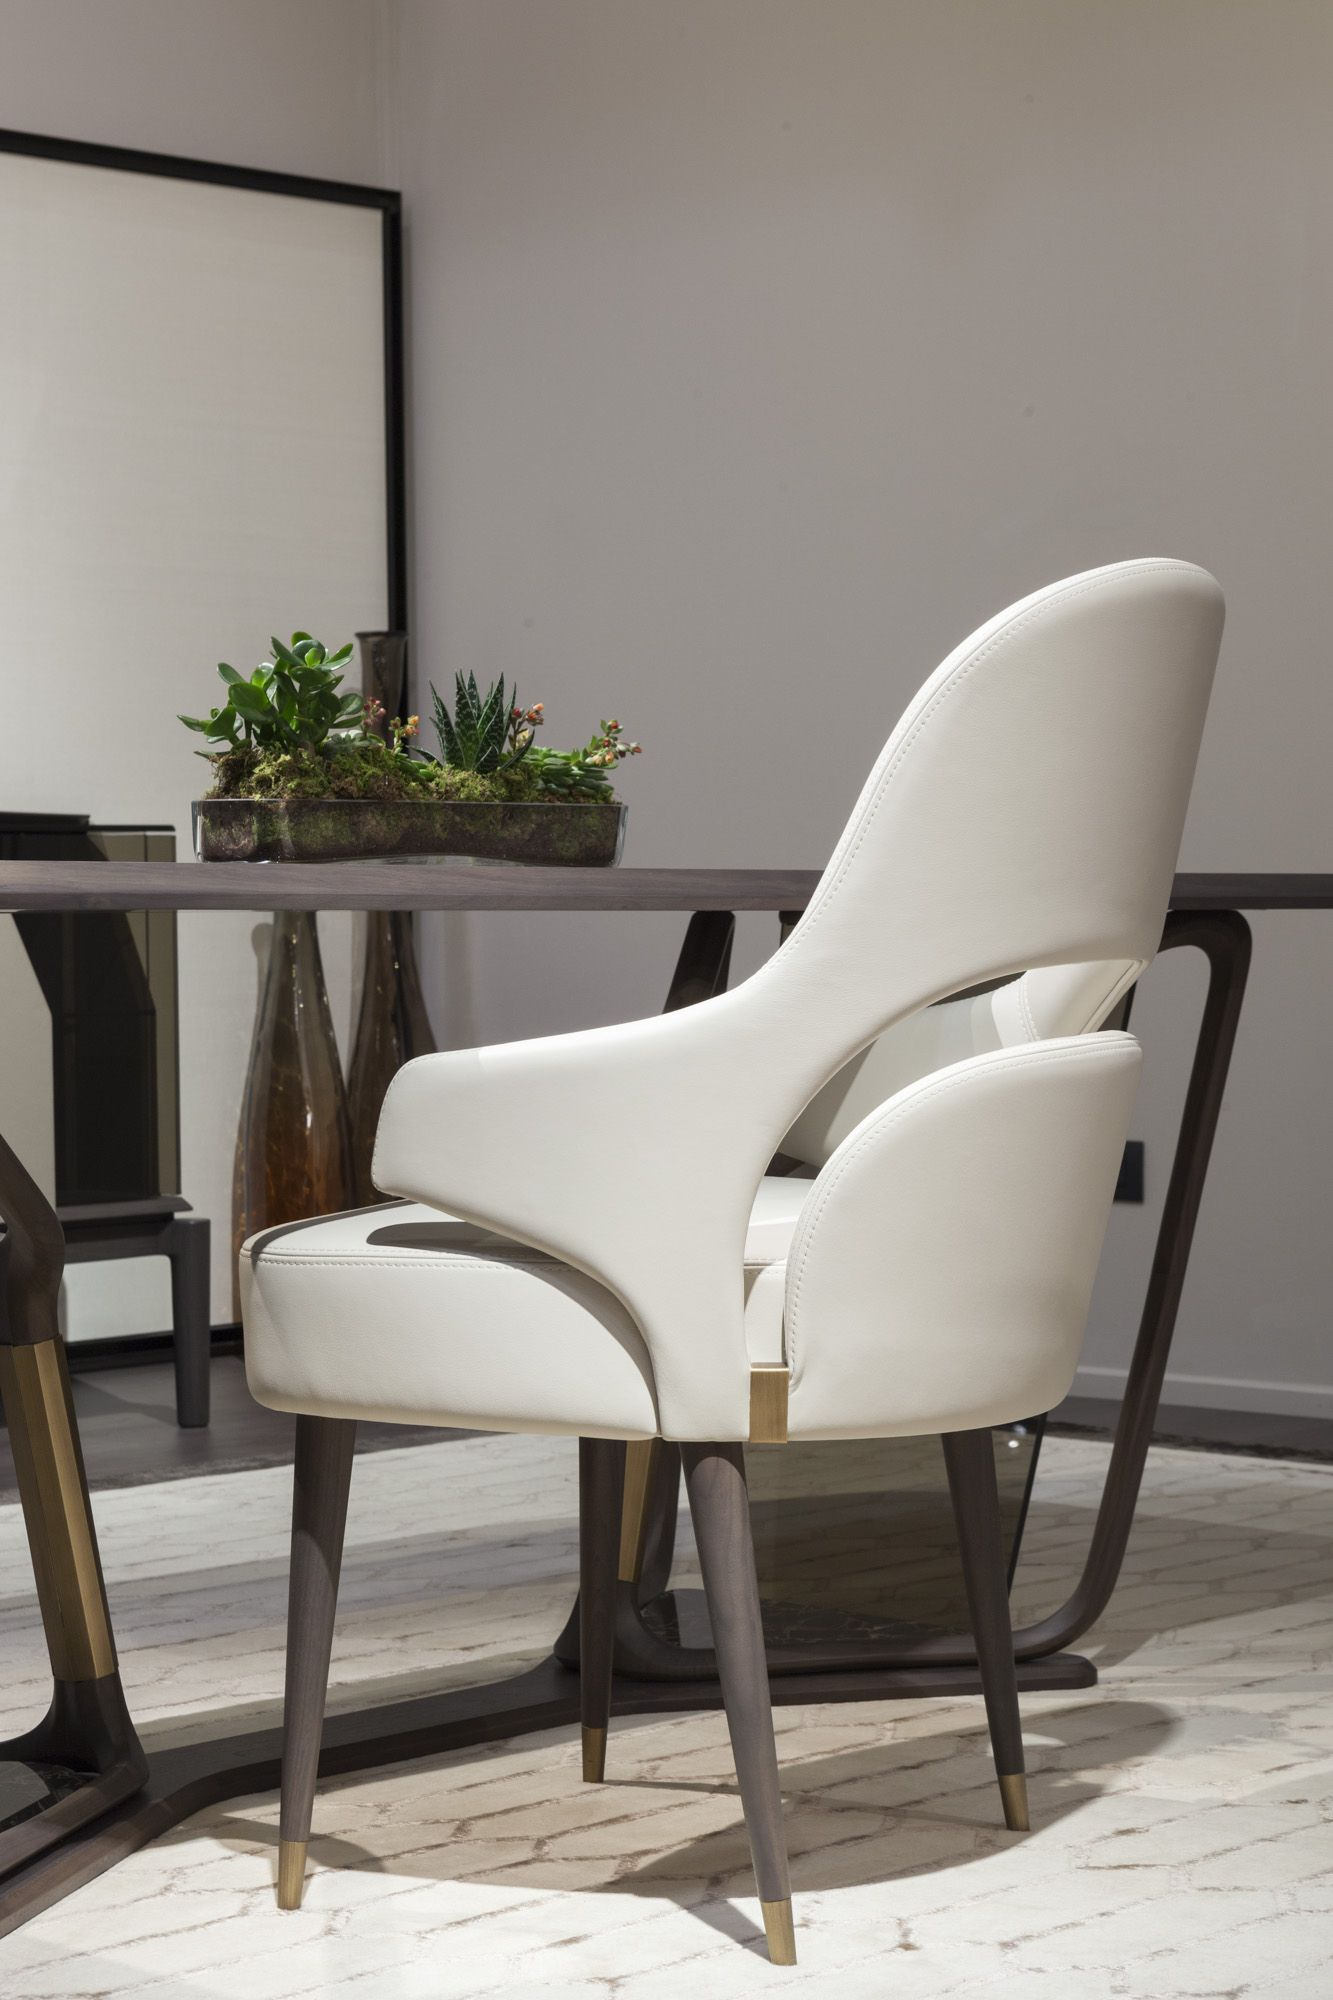 Modern Design Luxury Materials Furniture In Natural Wood